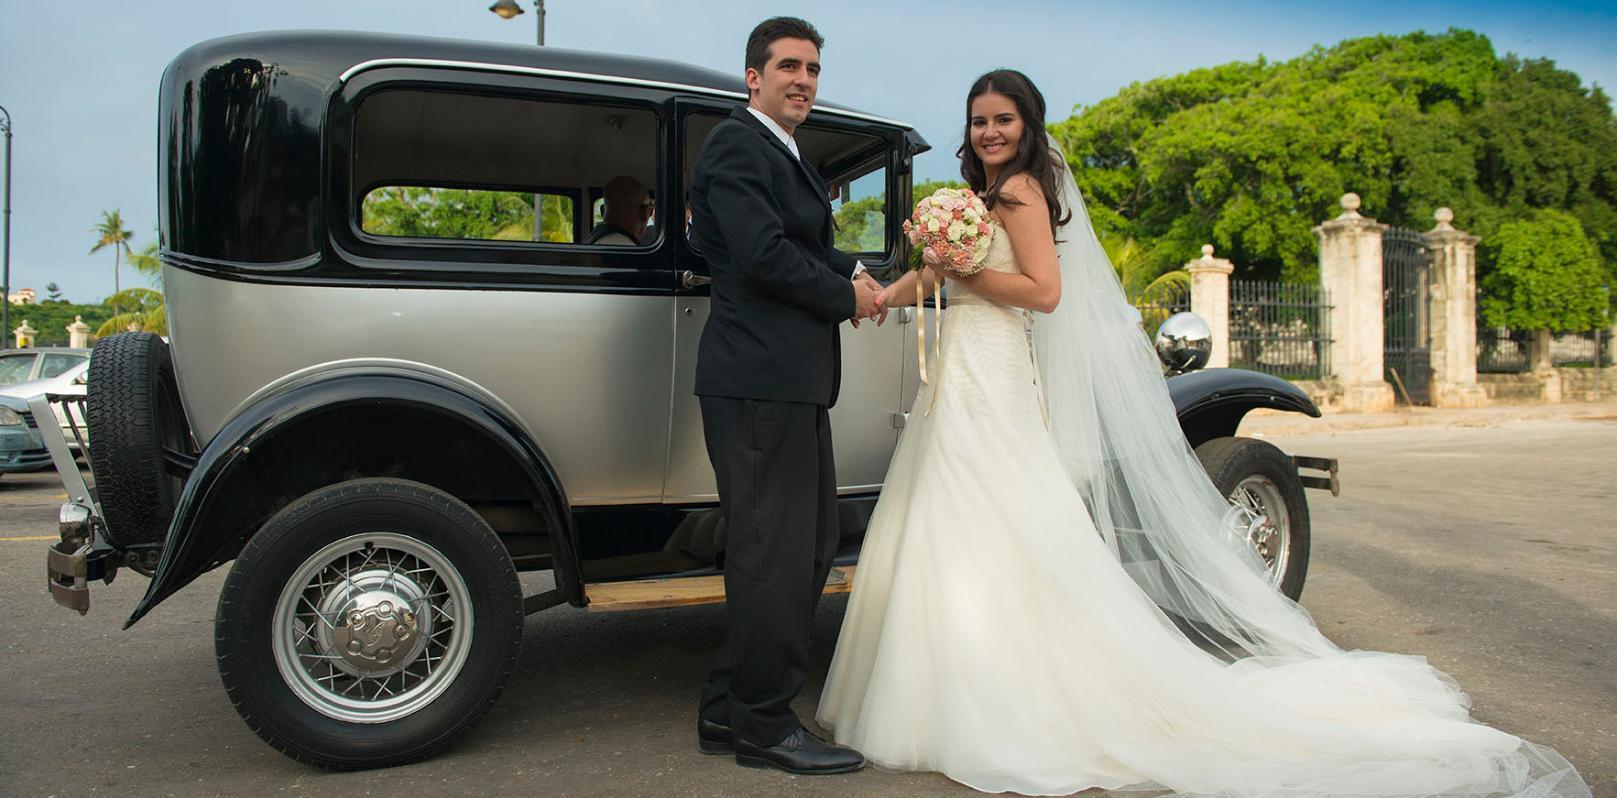 bodas-sin-clasificar-sin-tema-cuba-15552.jpg